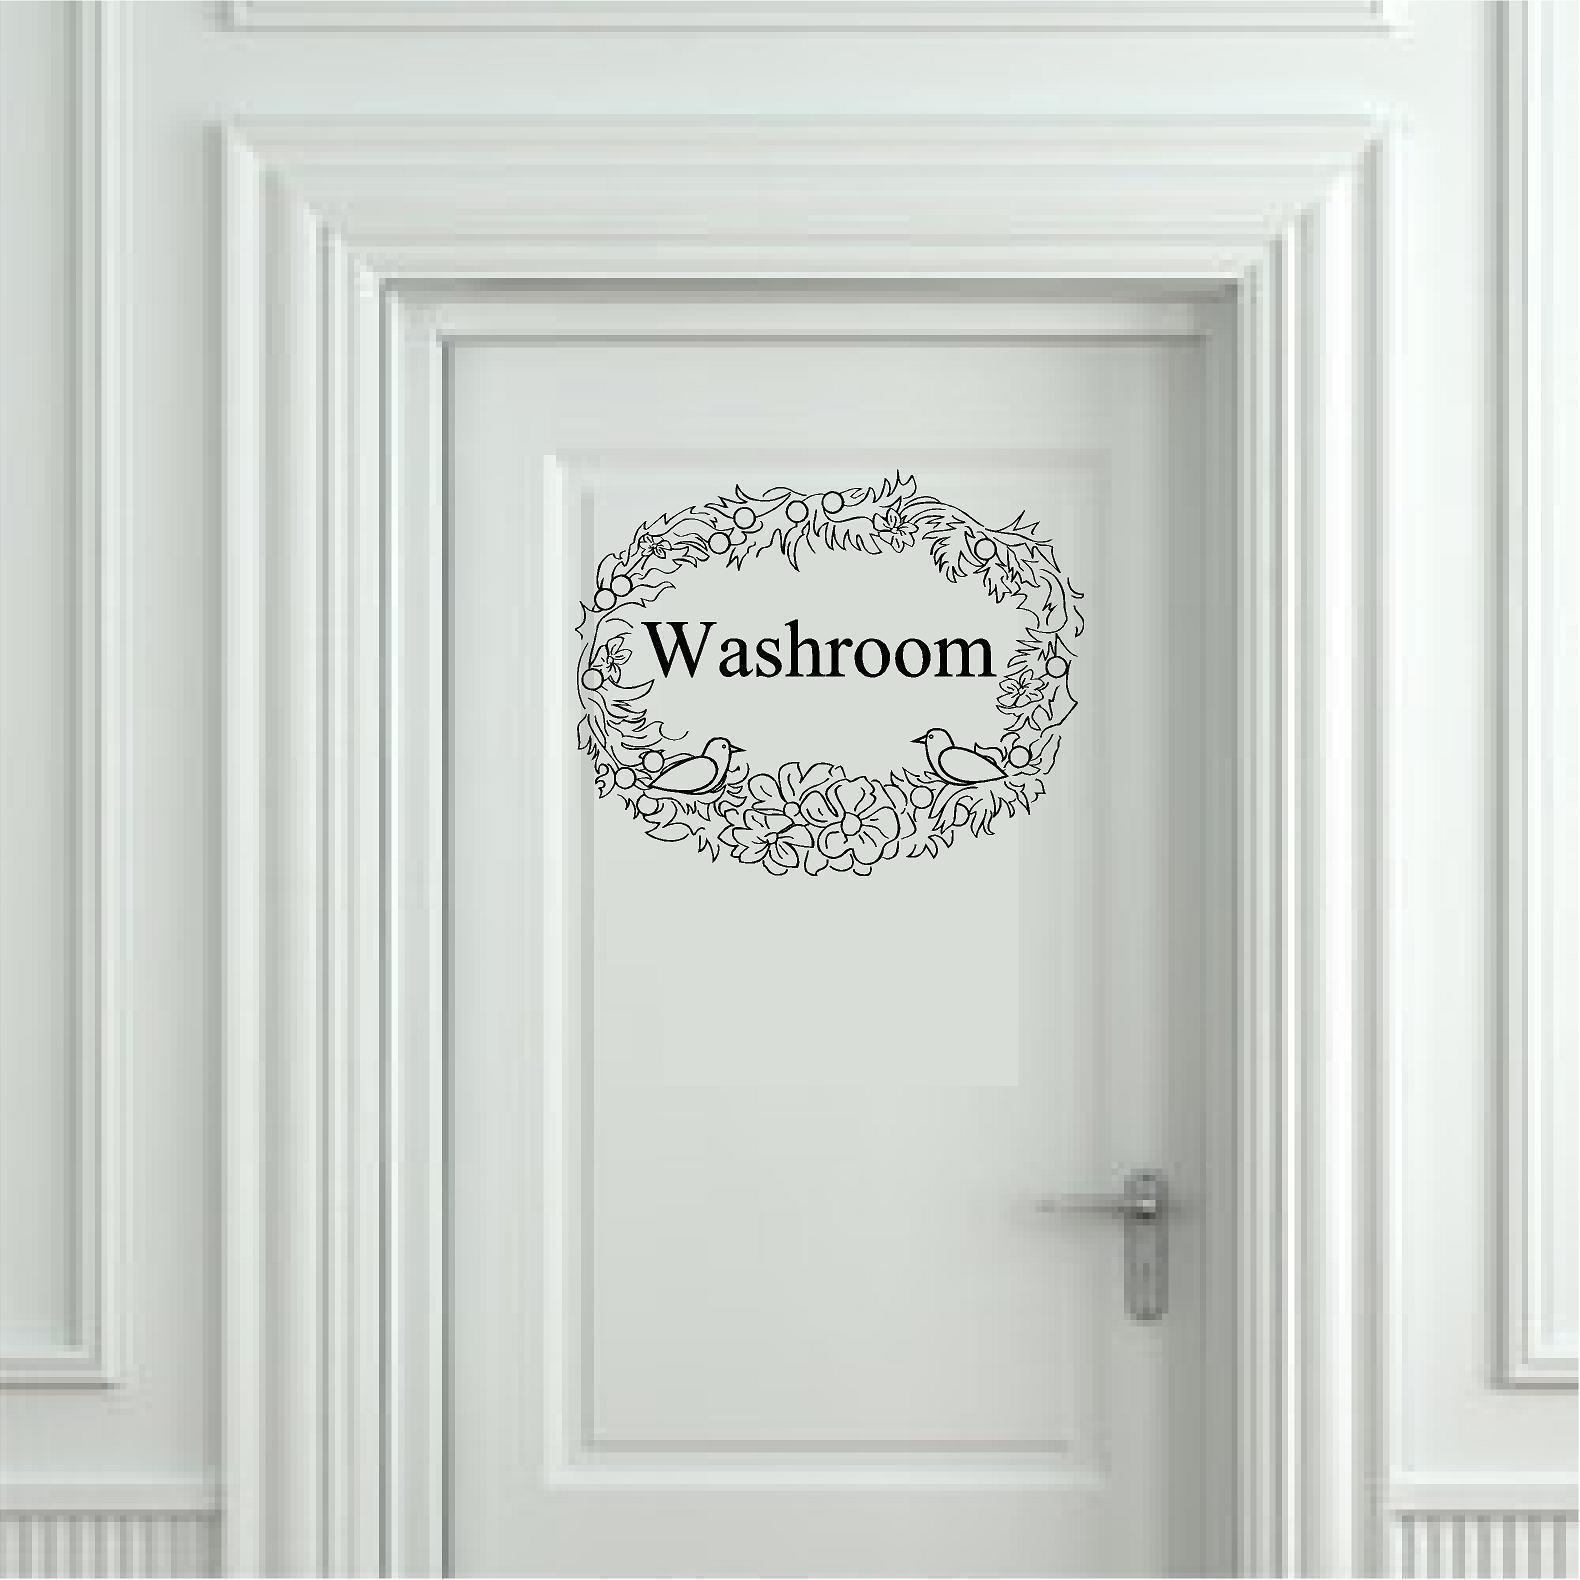 Washroom Bathroom door Decorates A Lovely and Interesting Room Guest Bath Vinyl Sticker